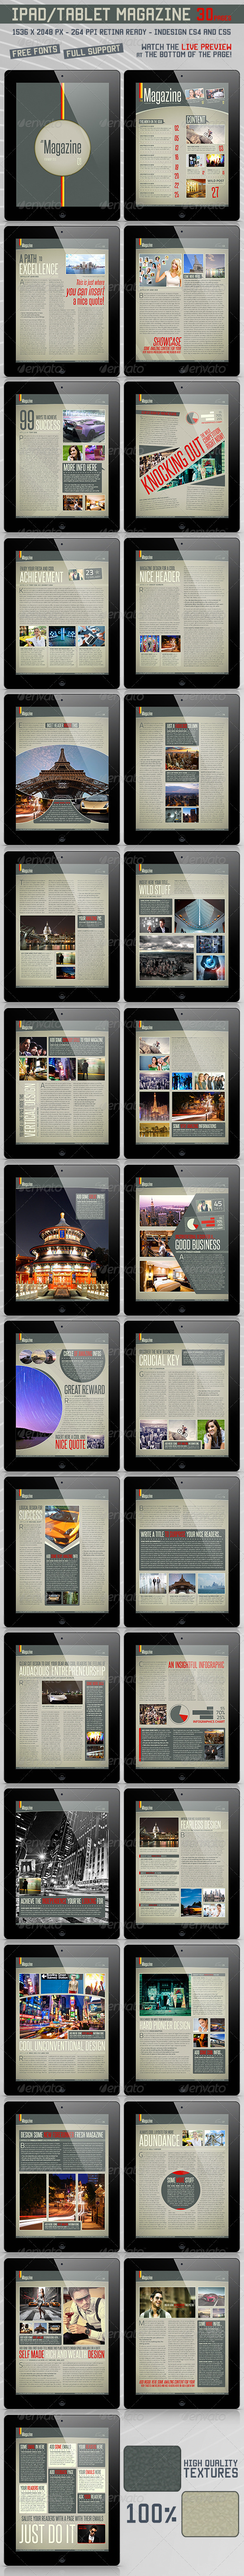 Pad/Tablet Retina Magazine 30 Pages - Magazines Print Templates